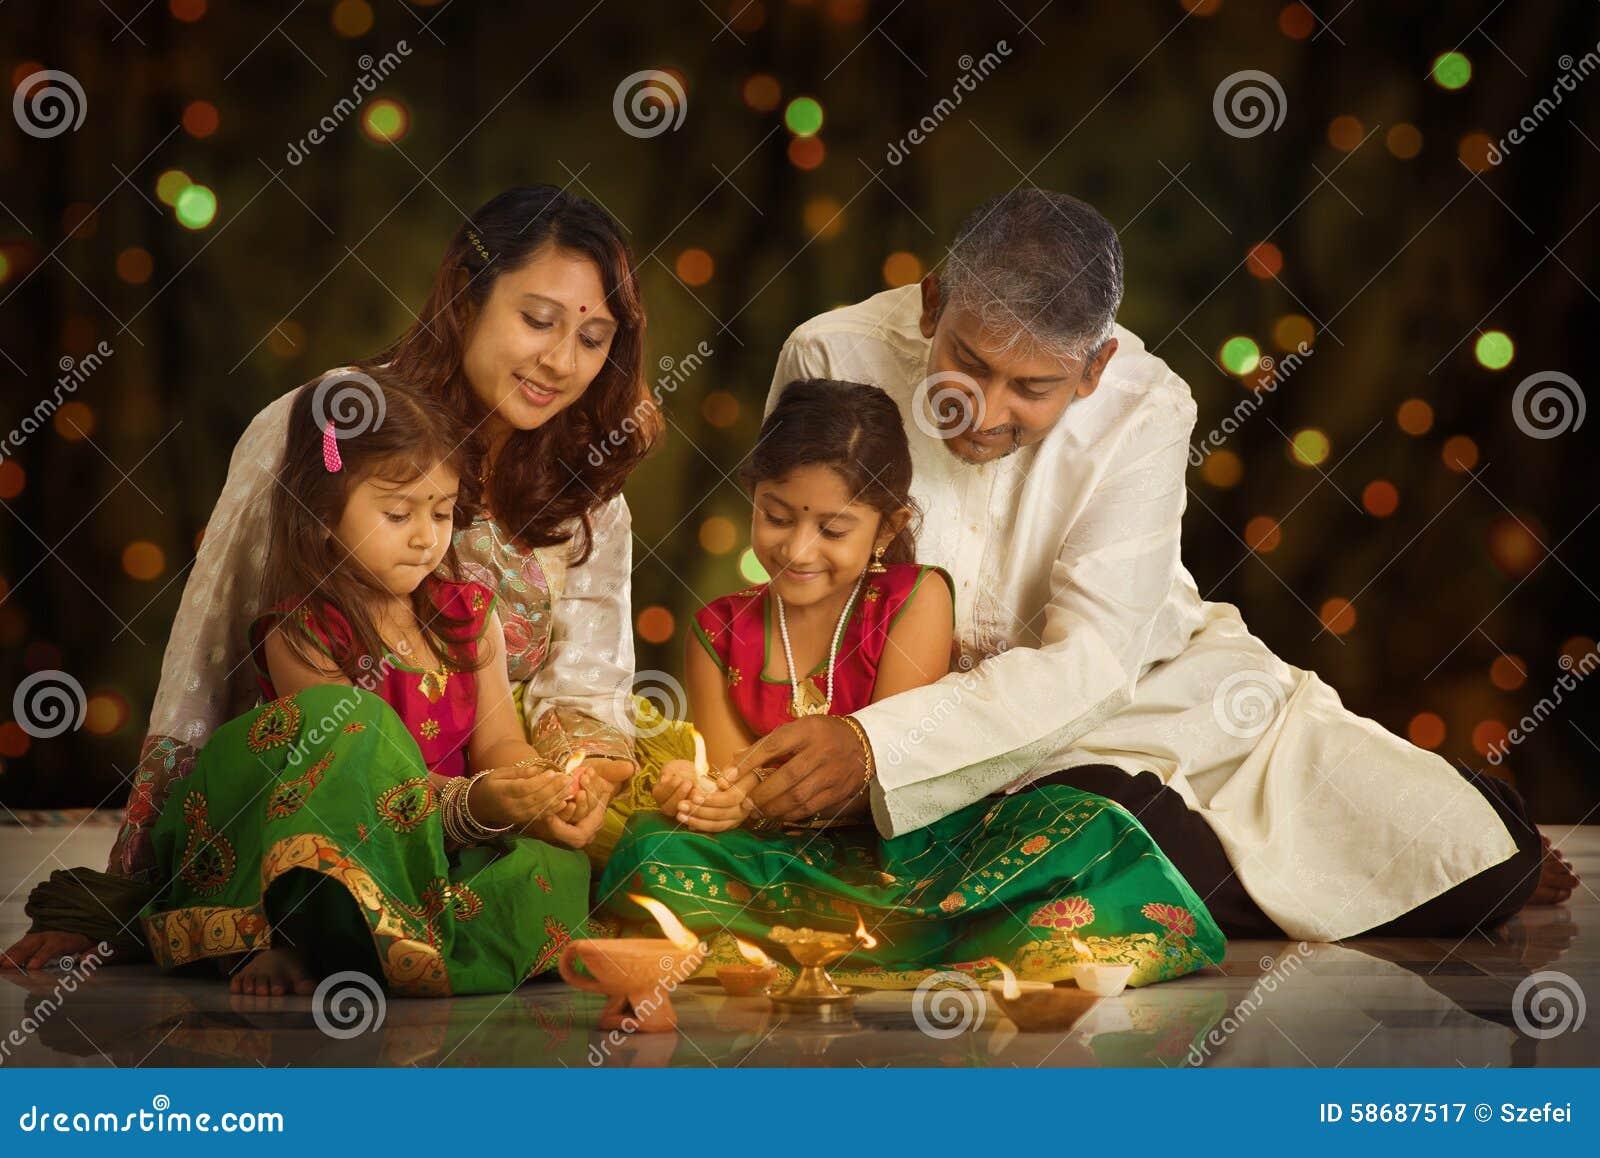 Indian family celebrating Diwali, fesitval of lights